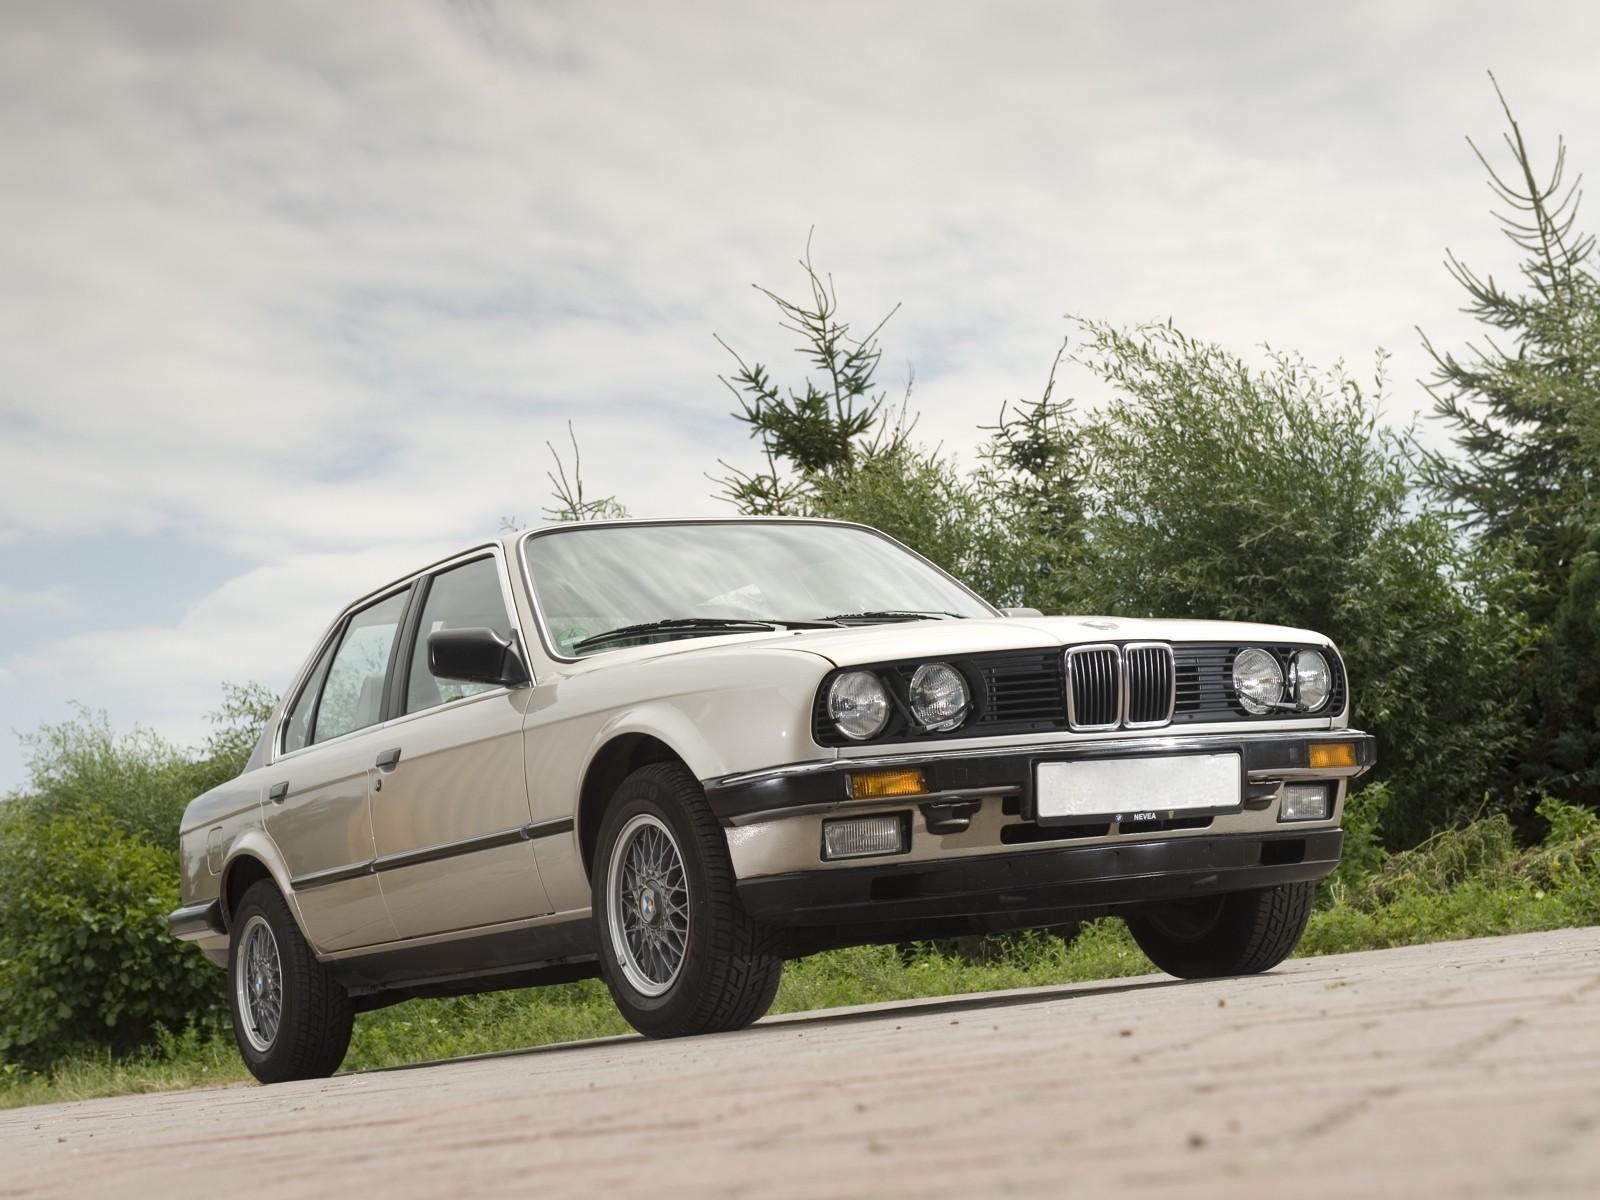 Bmw 3 series sedan e30 specs 1982 1983 1984 1985 1986 bmw 3 series sedan e30 1982 1992 sciox Choice Image